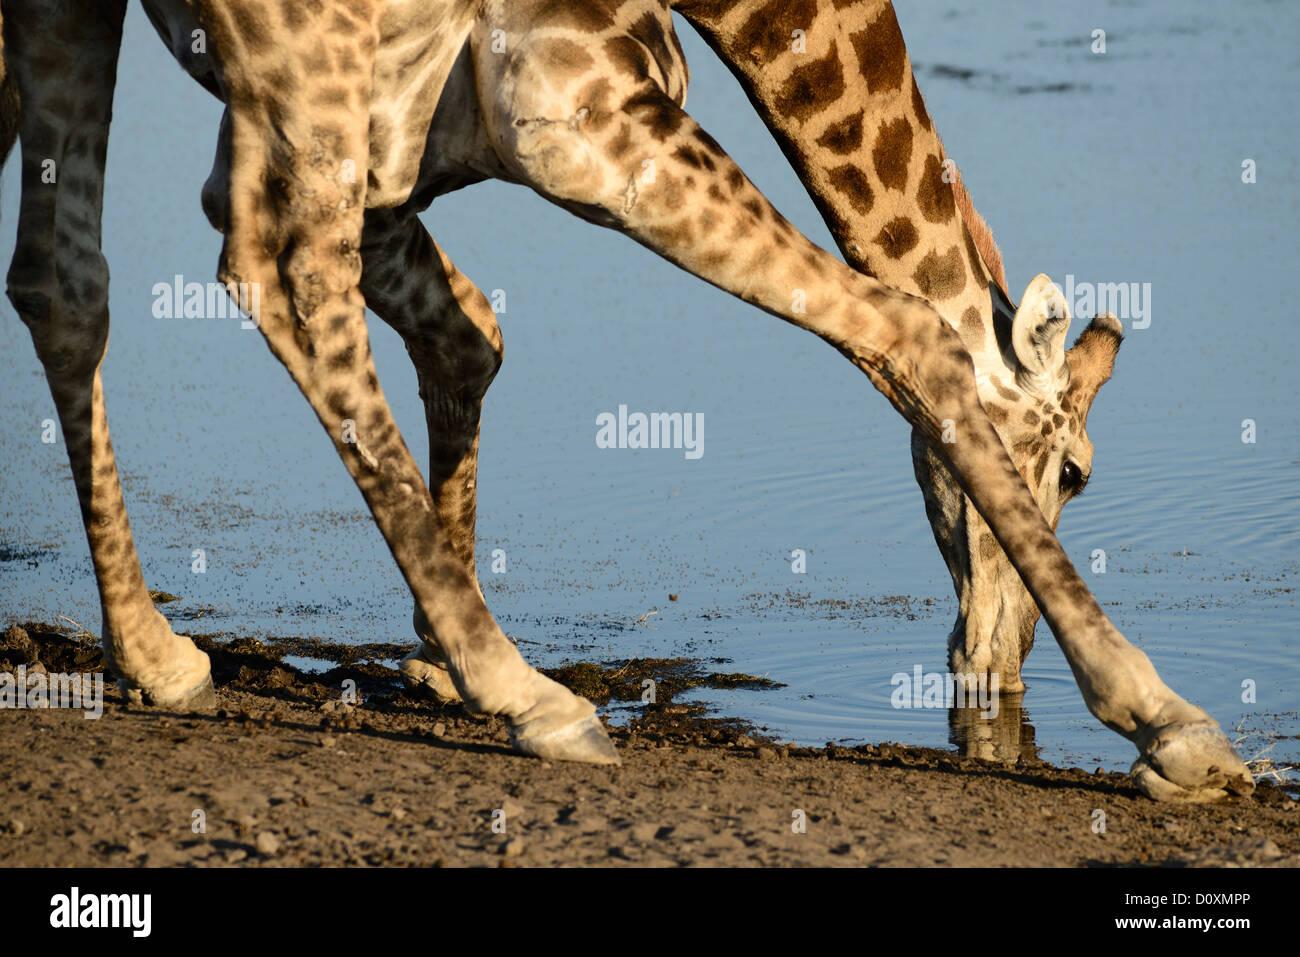 Afrika, Etosha, Nationalpark, Namibia, Afrika, Tier, bücken, trinken, Giraffe, Tiere, Horizontal, Ebenen, Safari, Stockbild